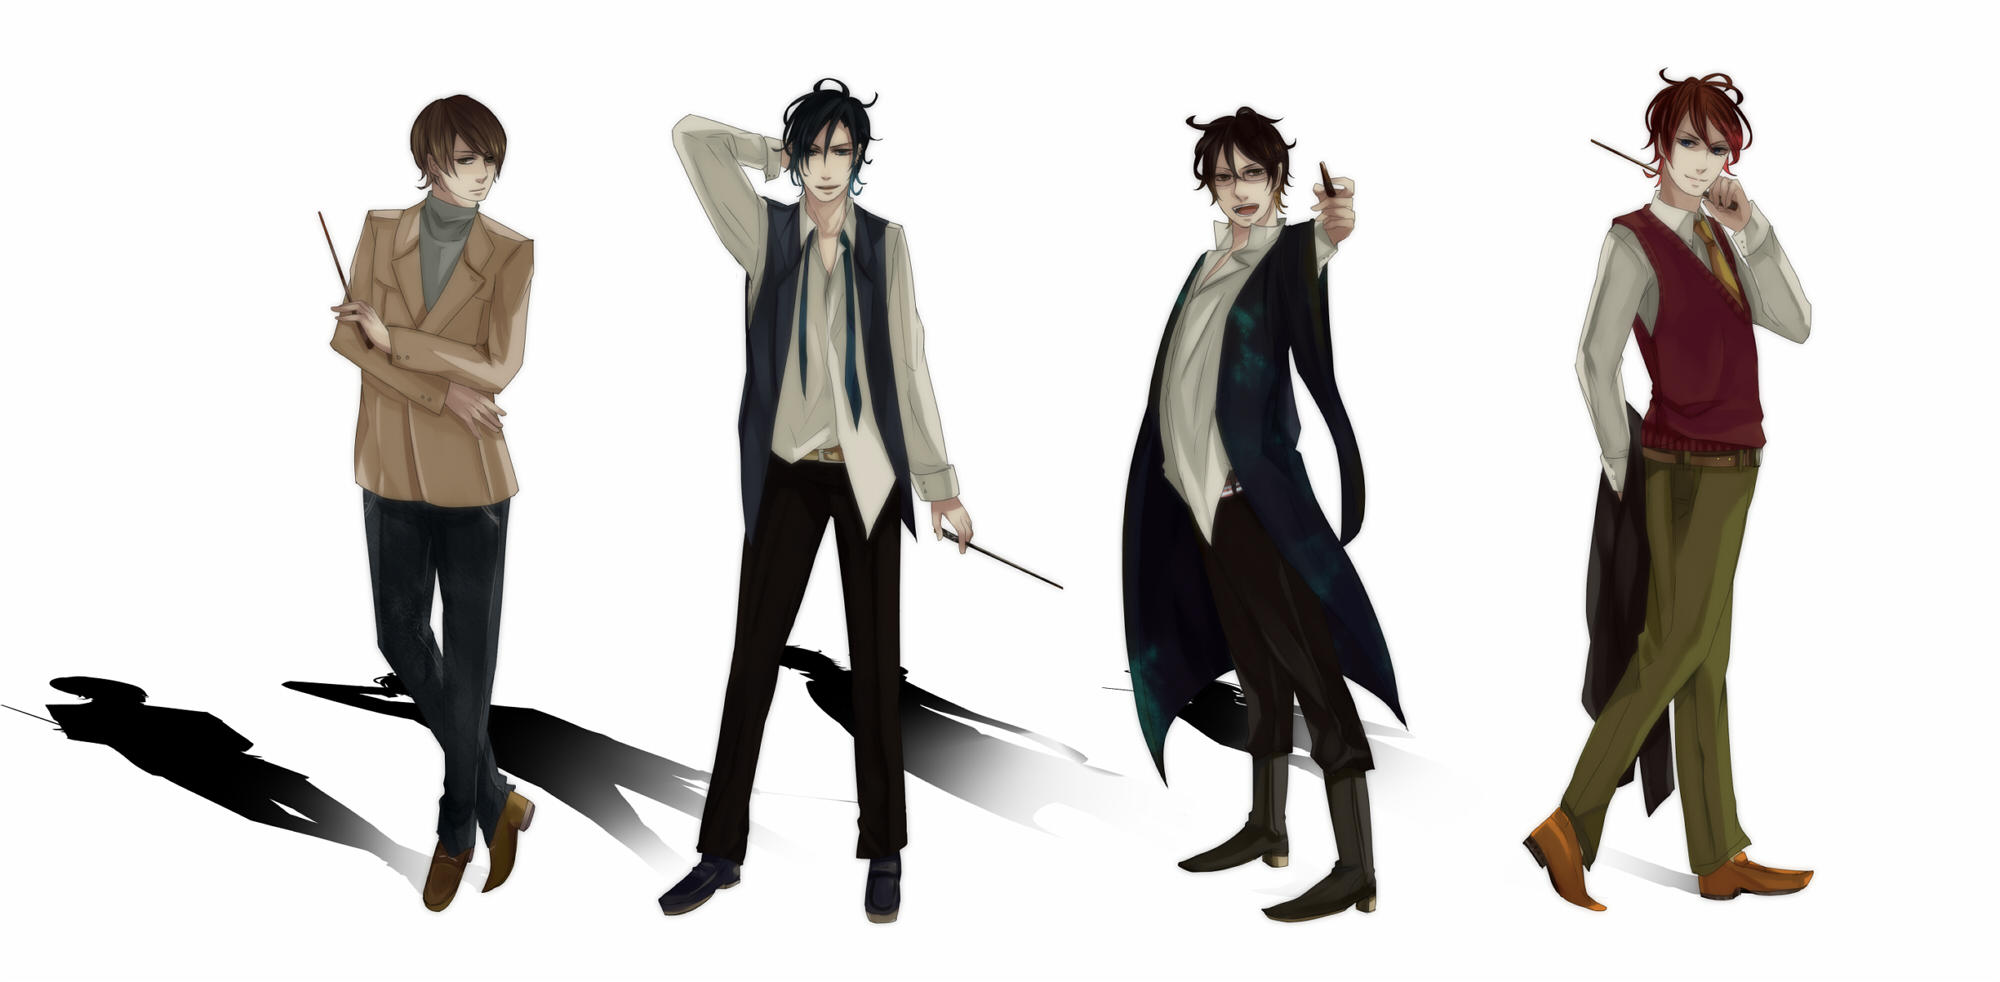 Harry Potter Image #614406 - Zerochan Anime Image Board